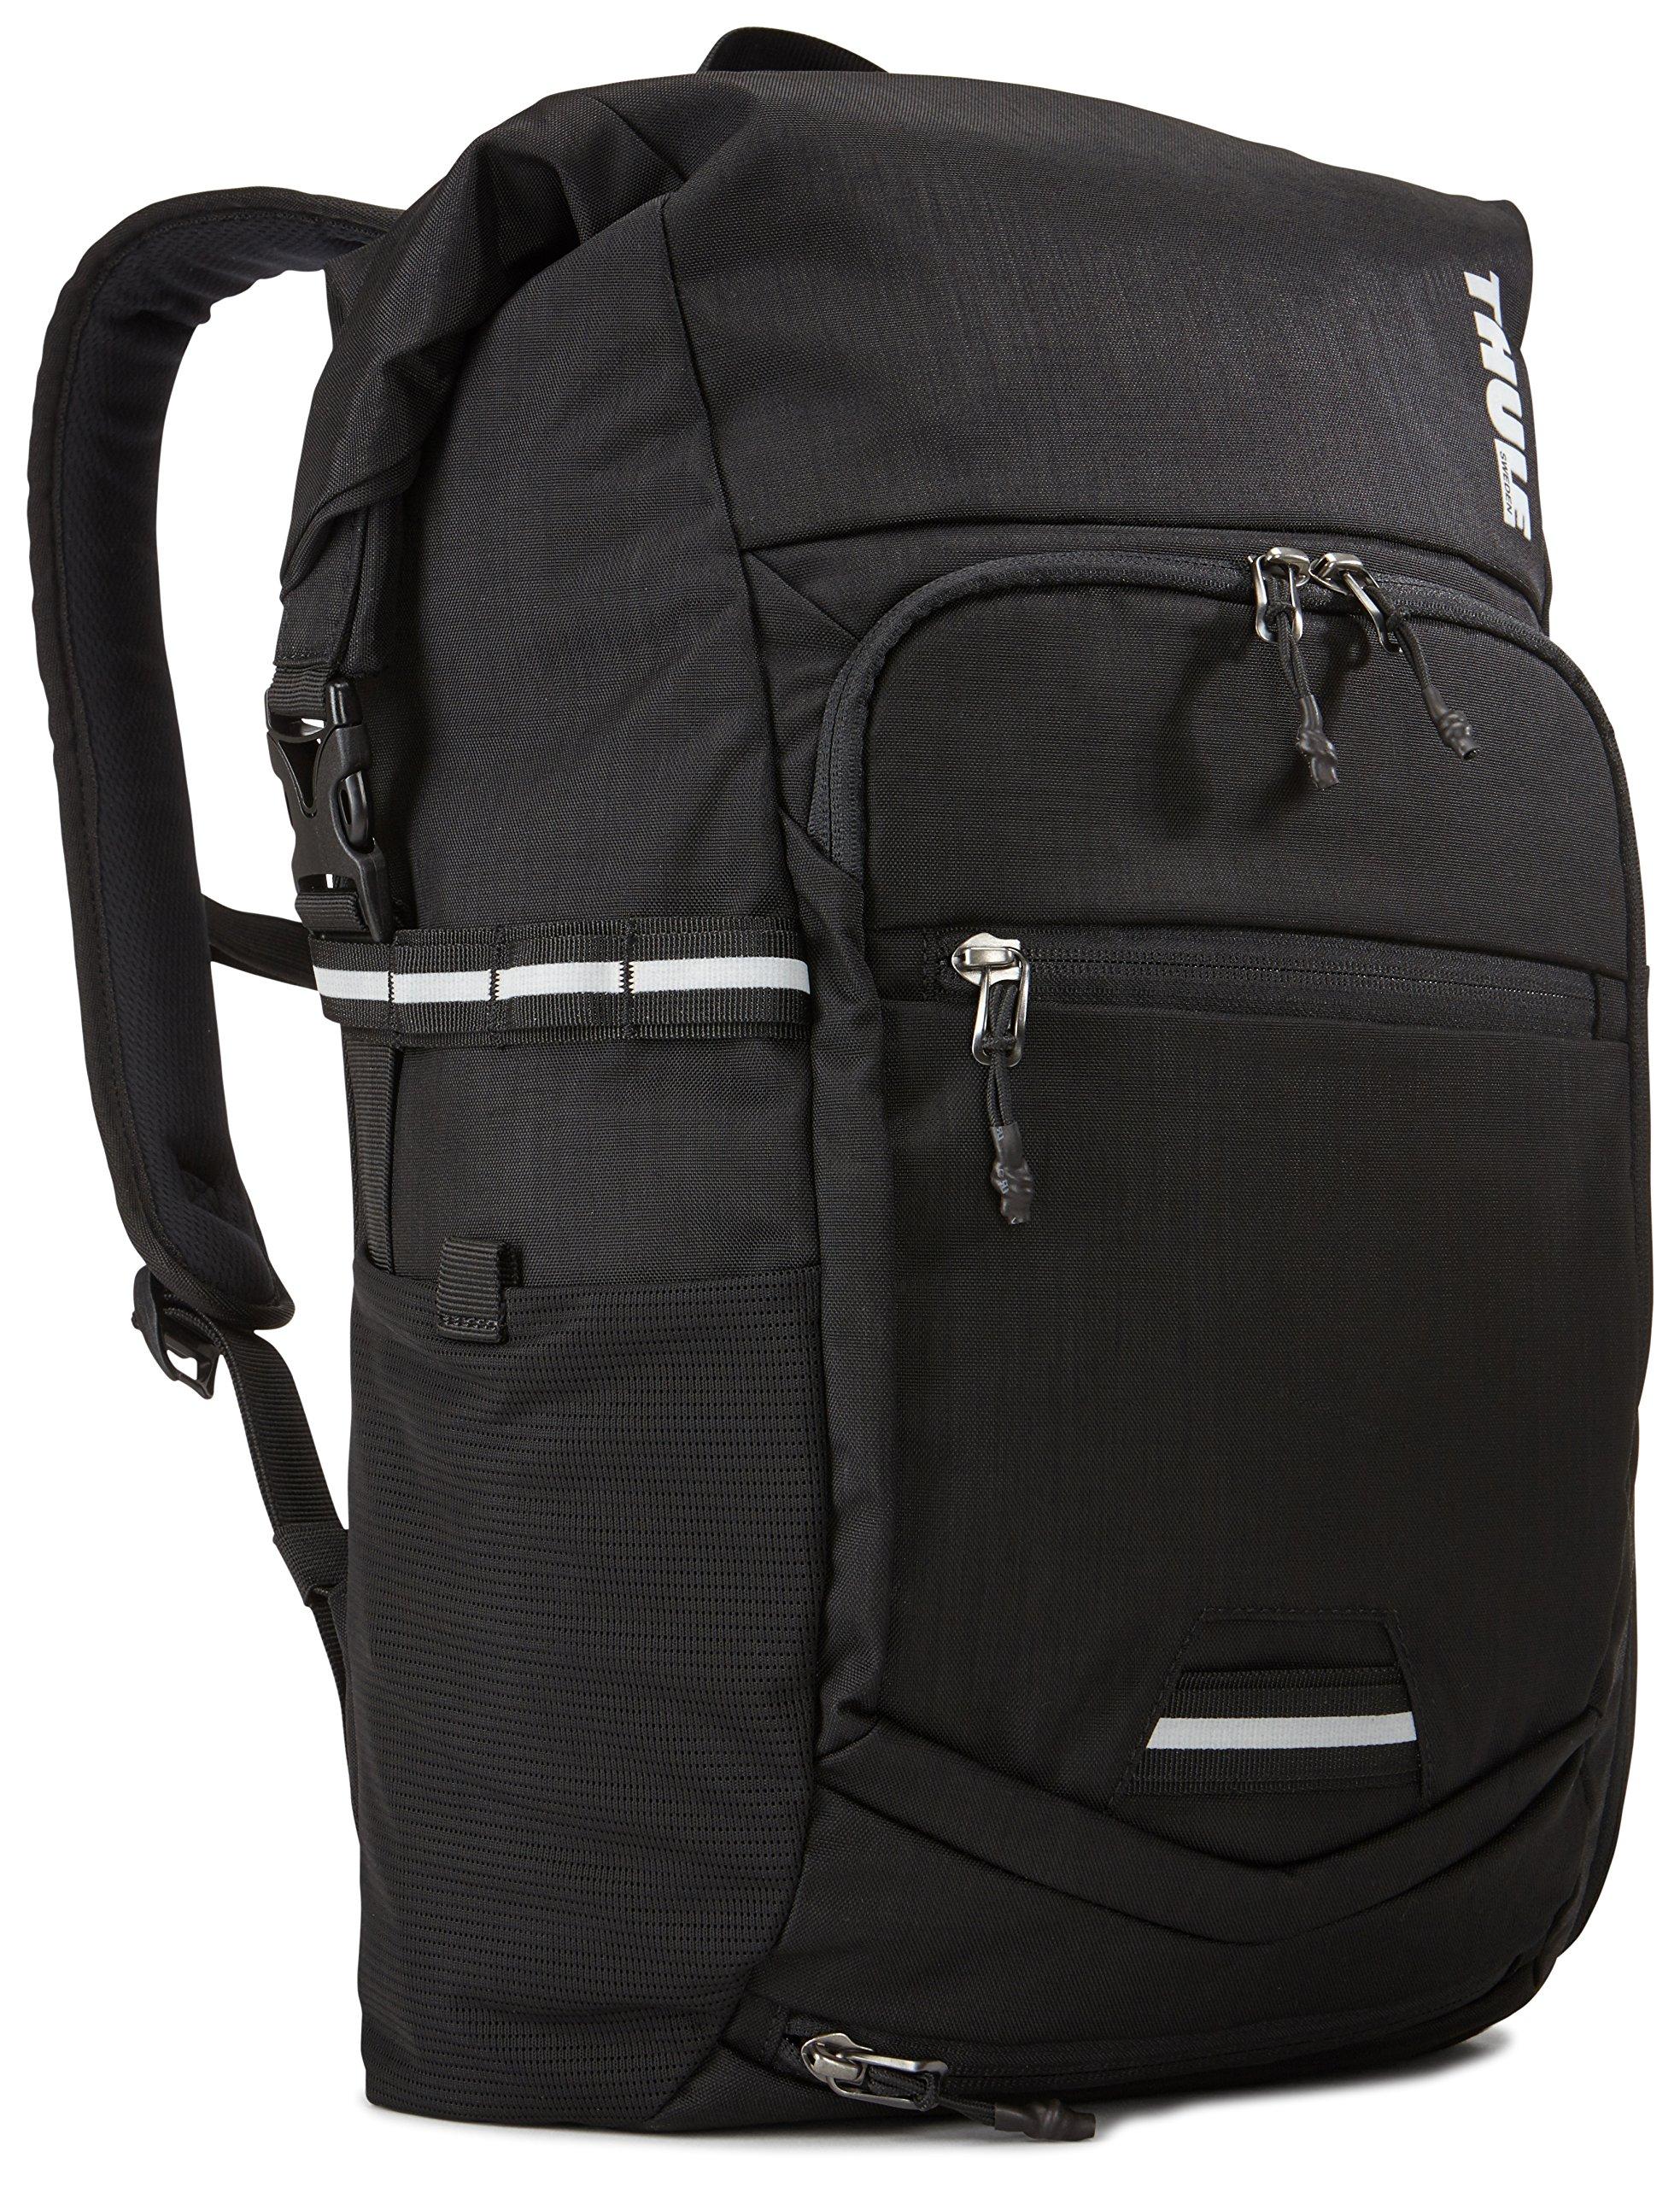 Thule Mochila Pack n Pedal para viajeros, Color Negro: Amazon.es: Deportes y aire libre